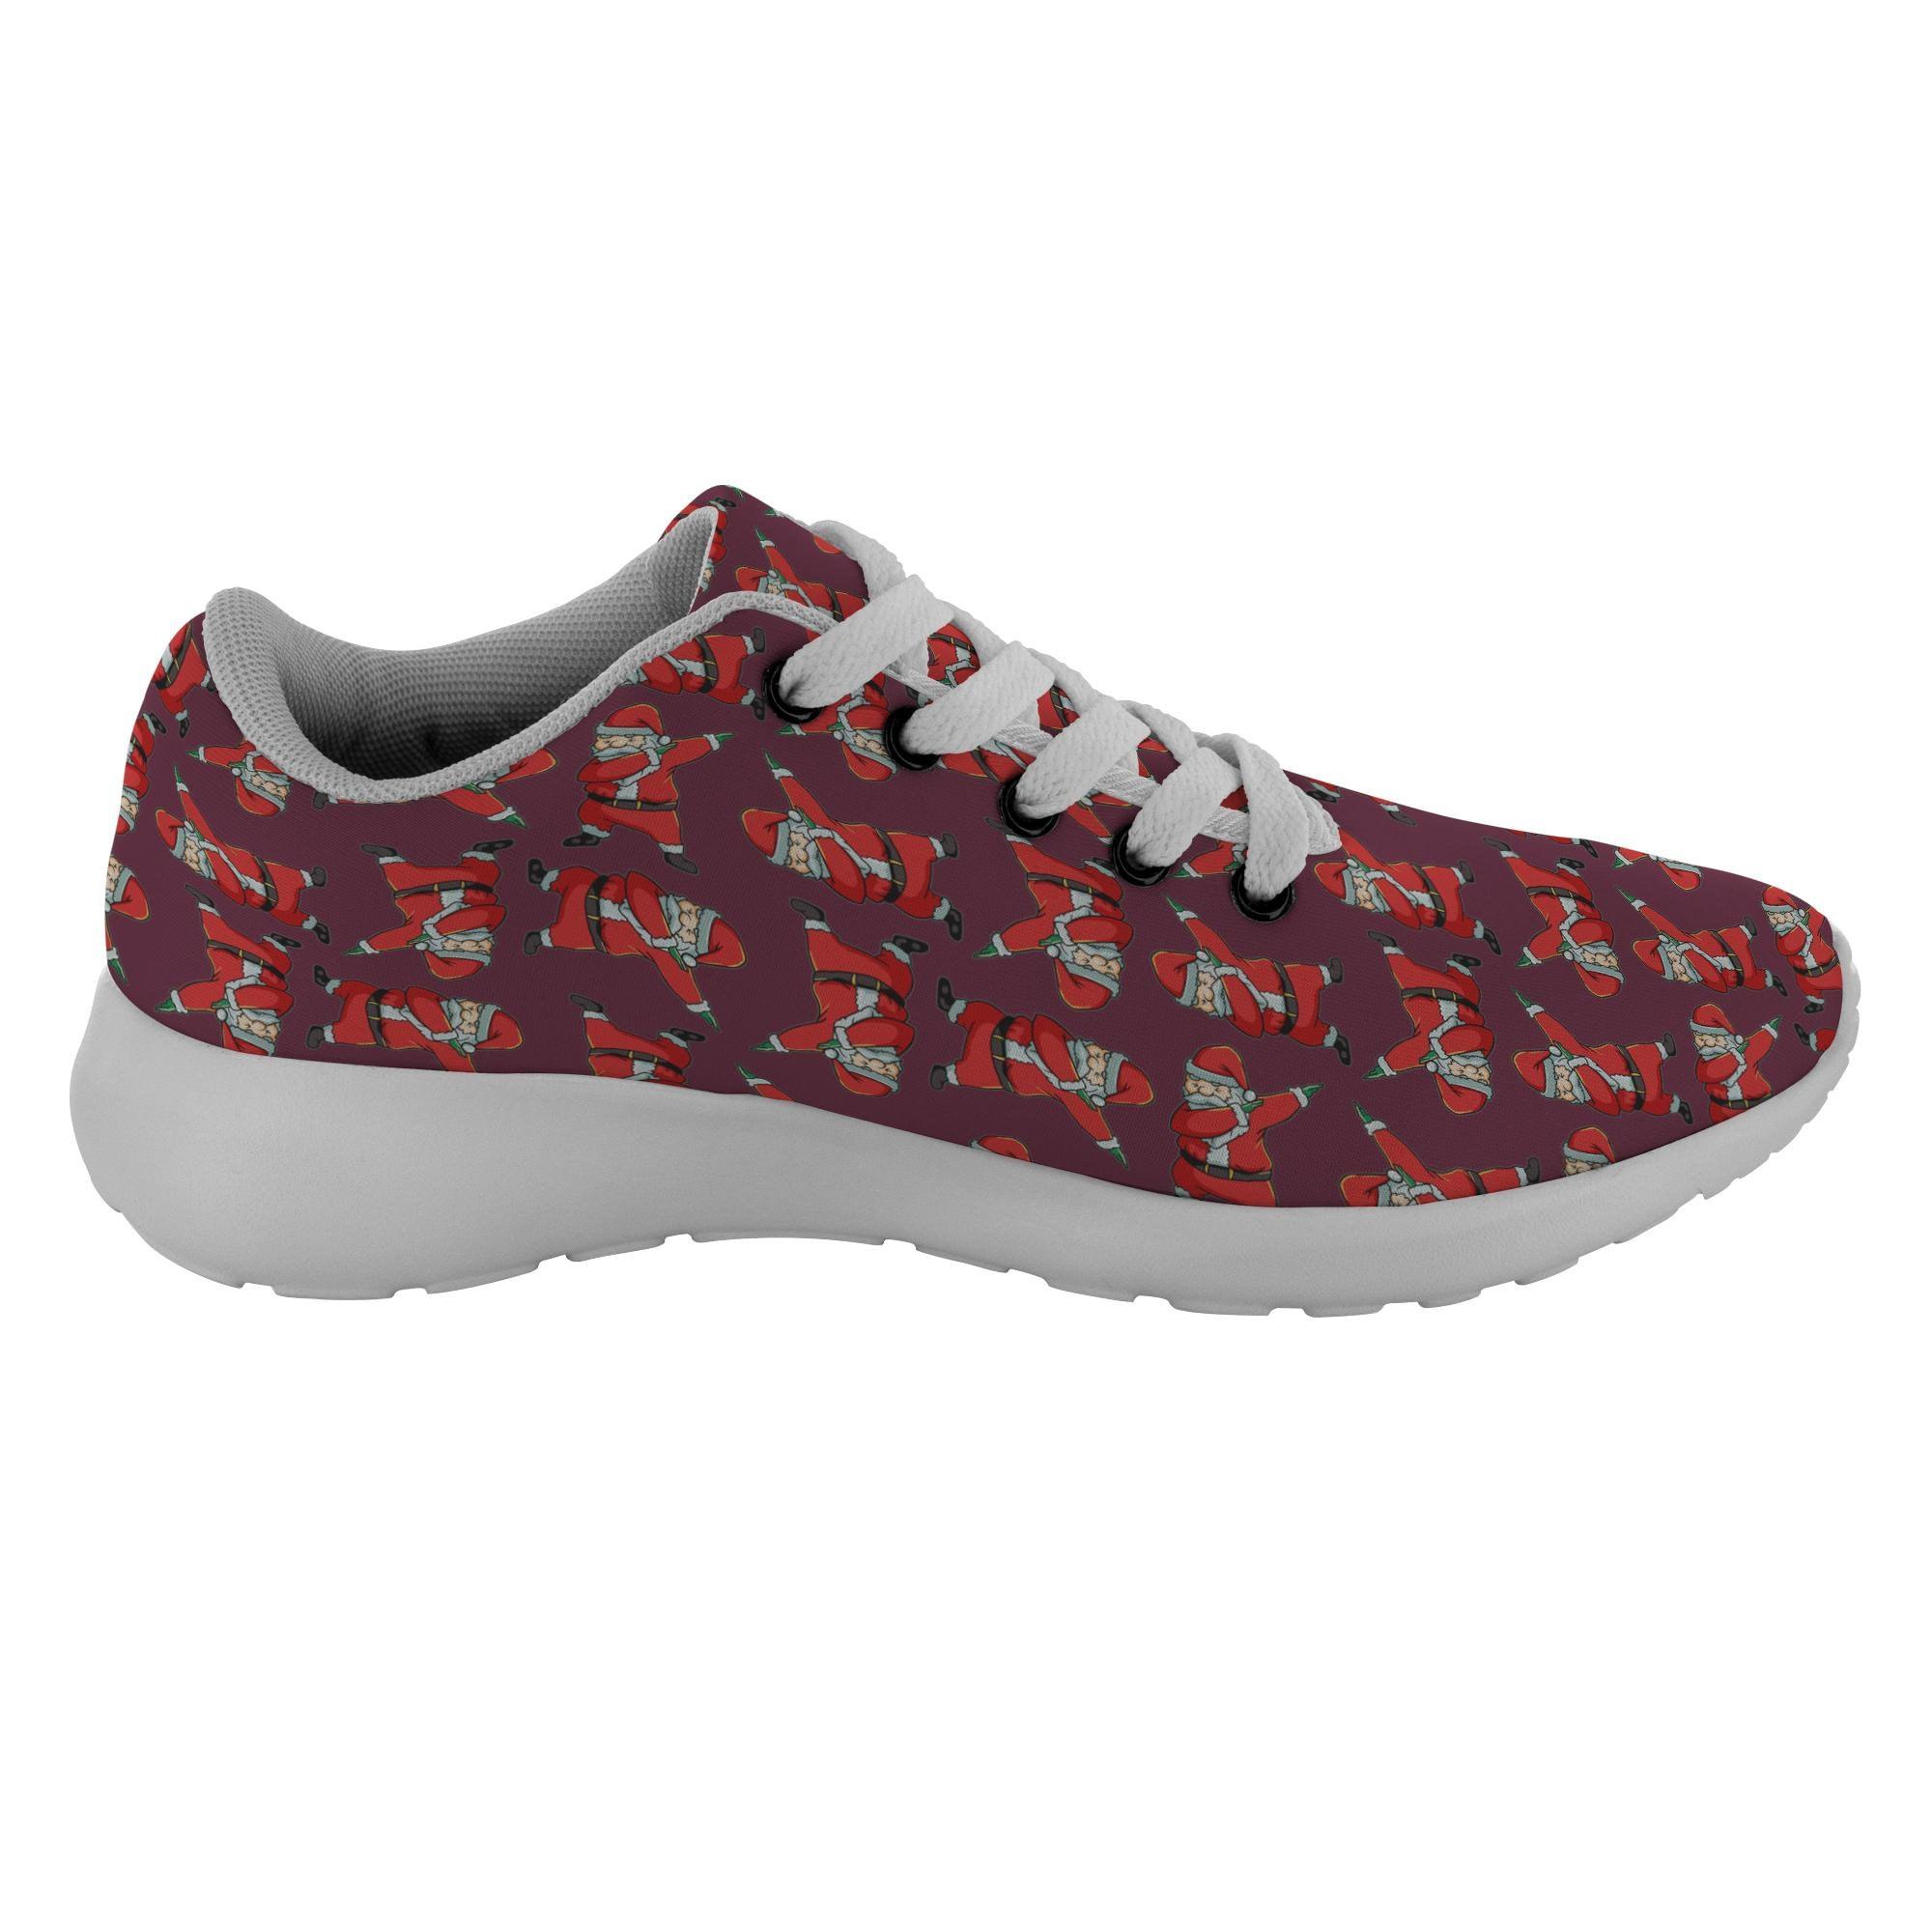 Santa mode Sneakers chaussures Casual chaussures Sneakers pour hommes, femmes, Decor tamponnant Funny cadeaux de vacances 84b966